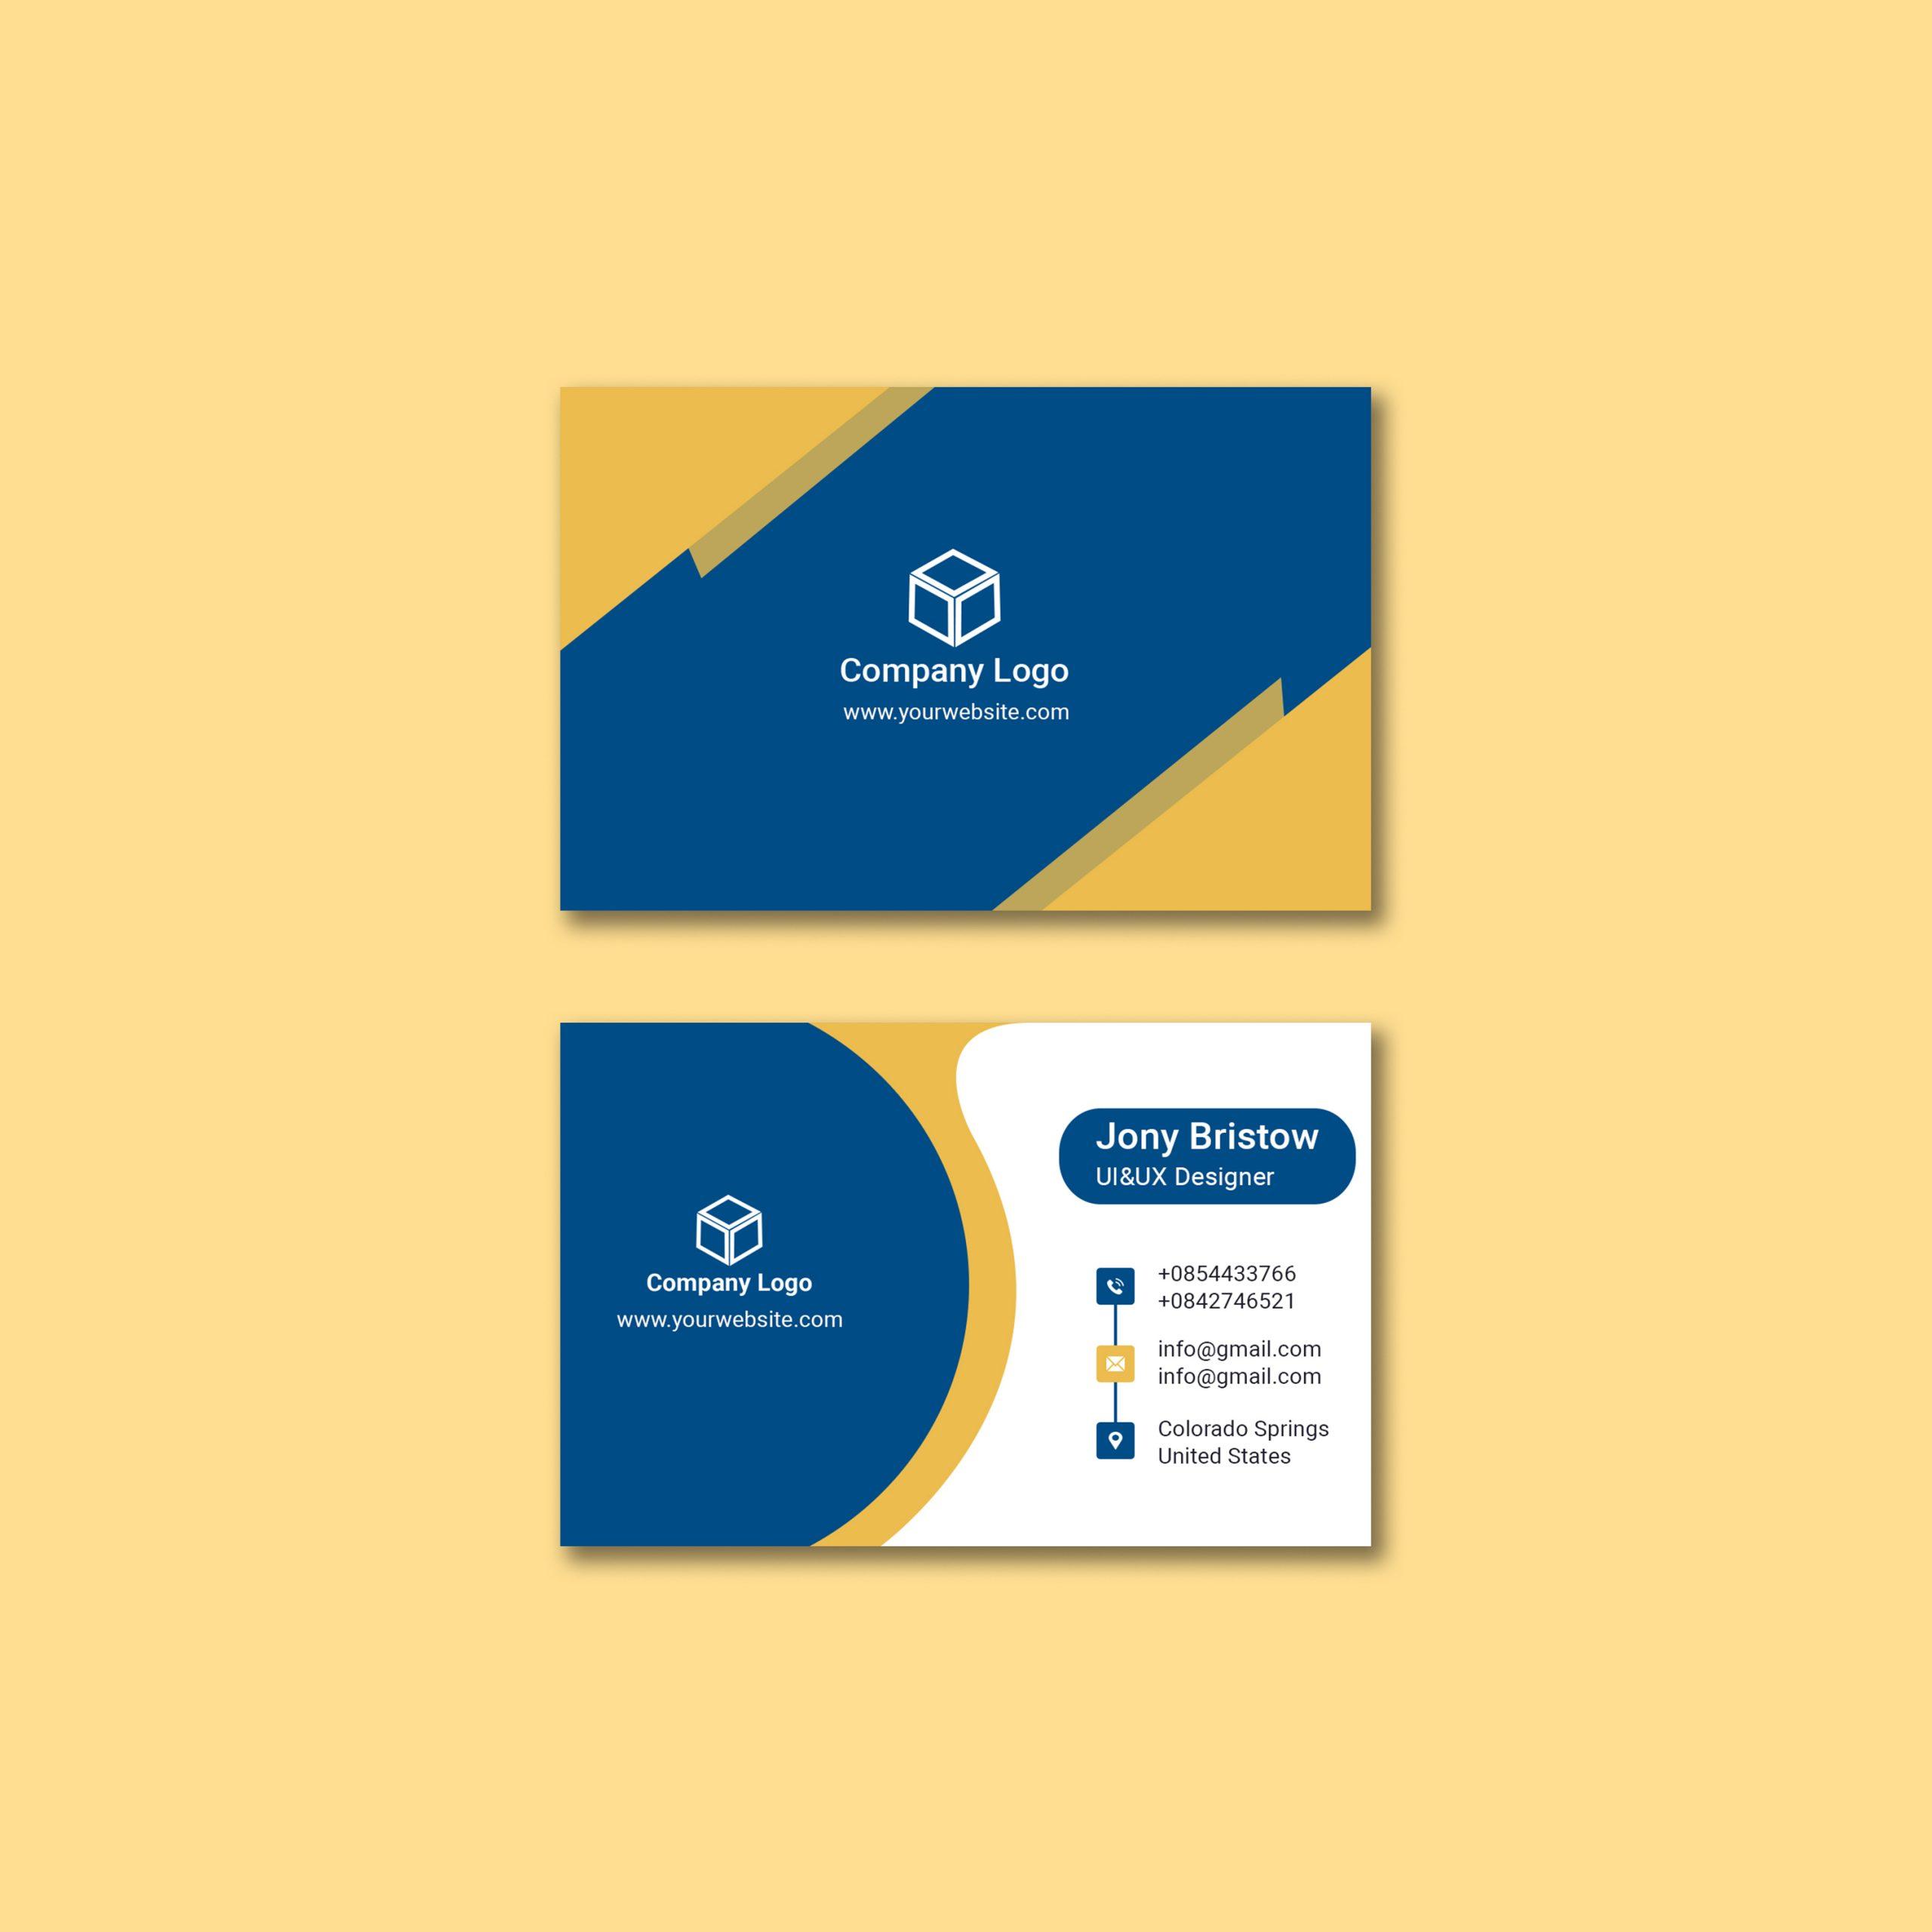 3091634 scaled - کارت ویزیت شرکتی رایگان لایه باز